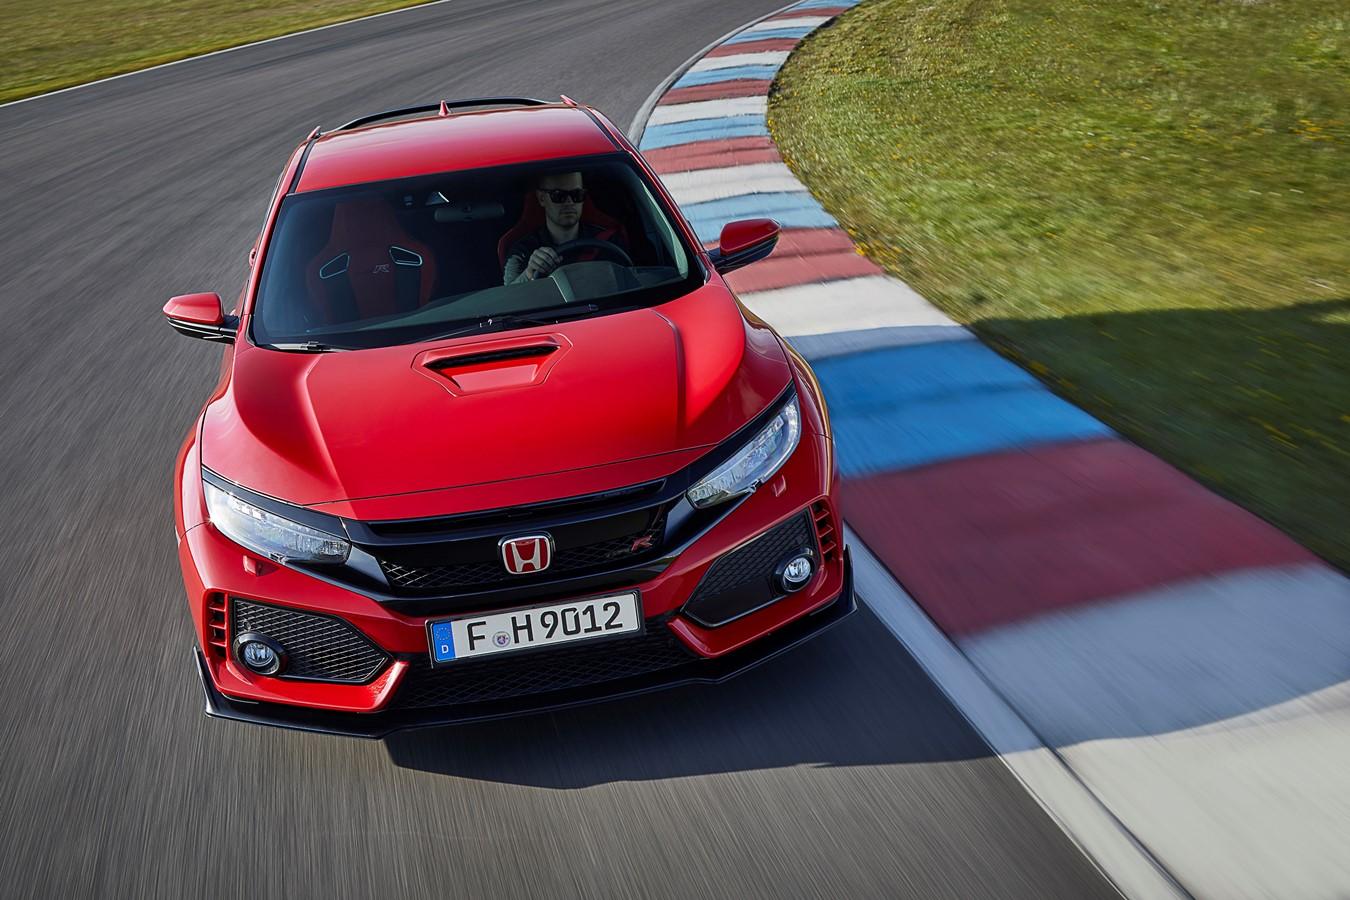 2017 Honda Civic Type R 98 Power Steering